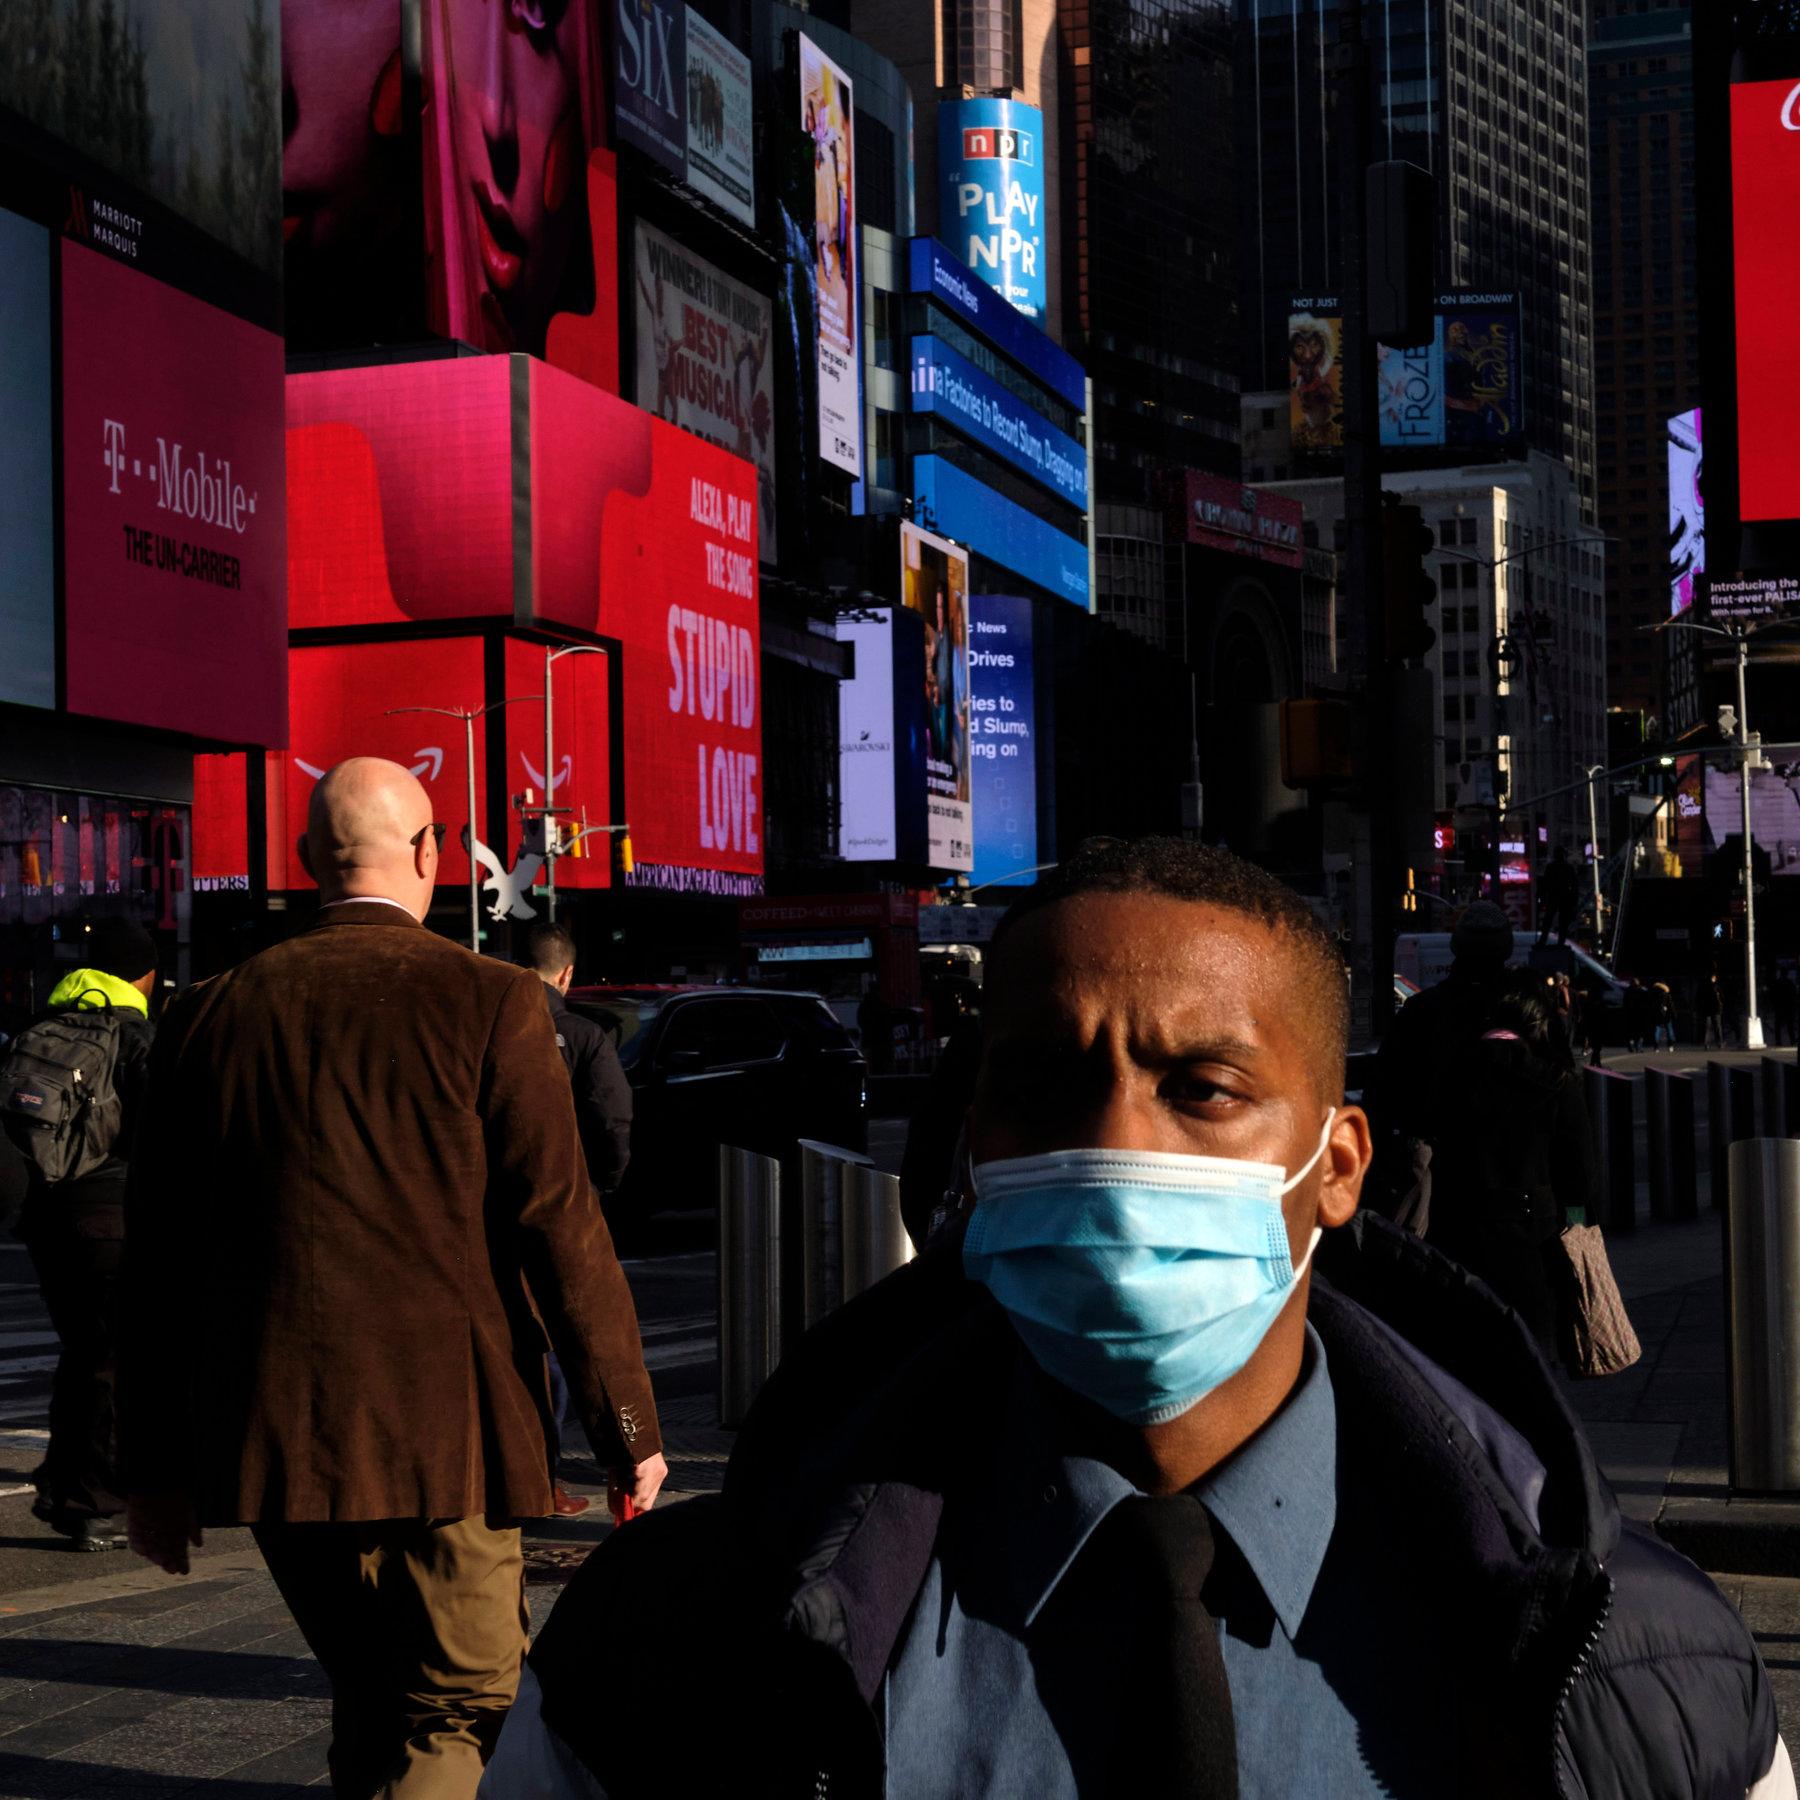 Coronavirus Outbreak Will Spread in New York City, Officials Warn ...